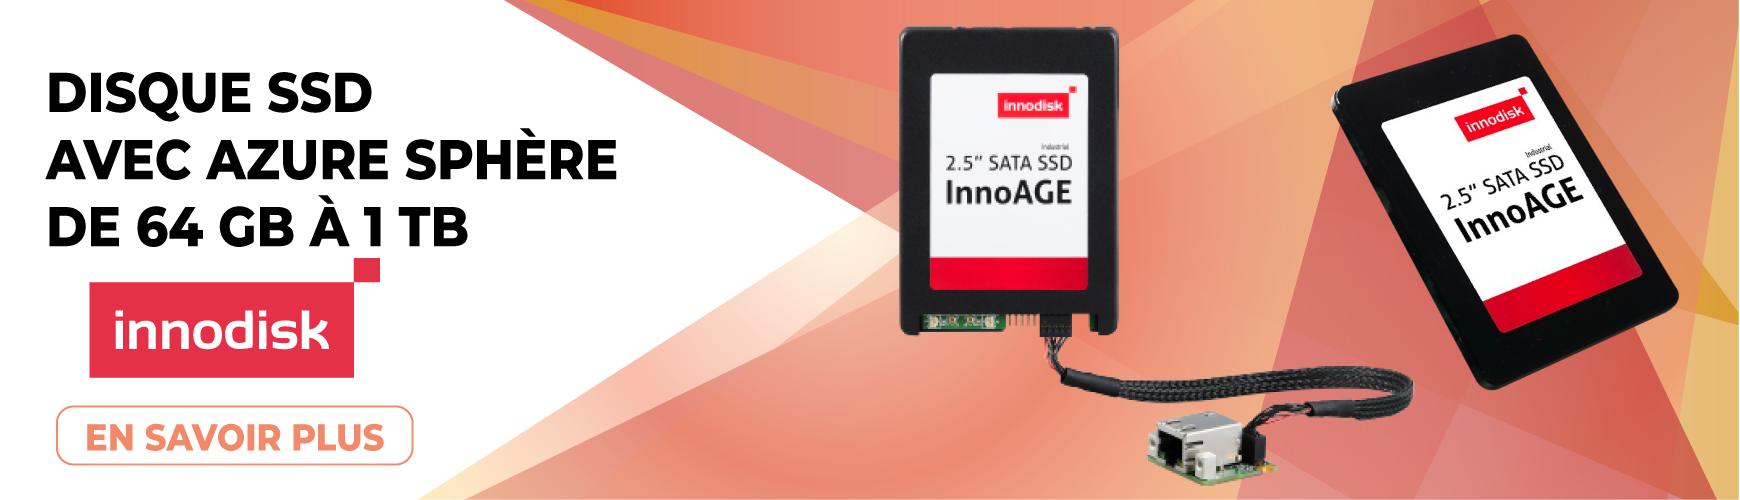 Disque SSD avec Azure Sphere : InnoAGE